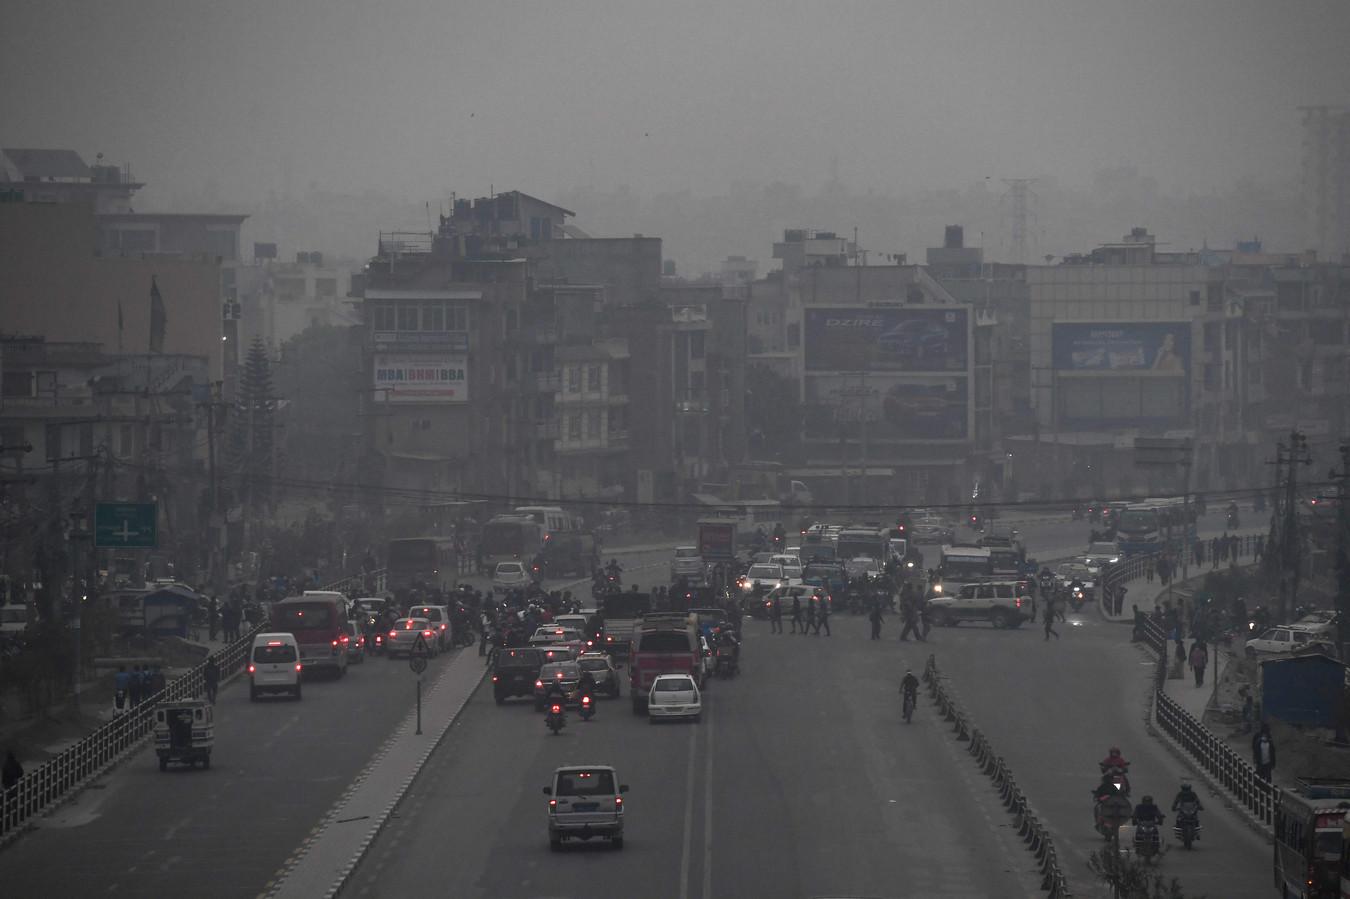 Katmandou sous la pollution, ce lundi 29 mars.